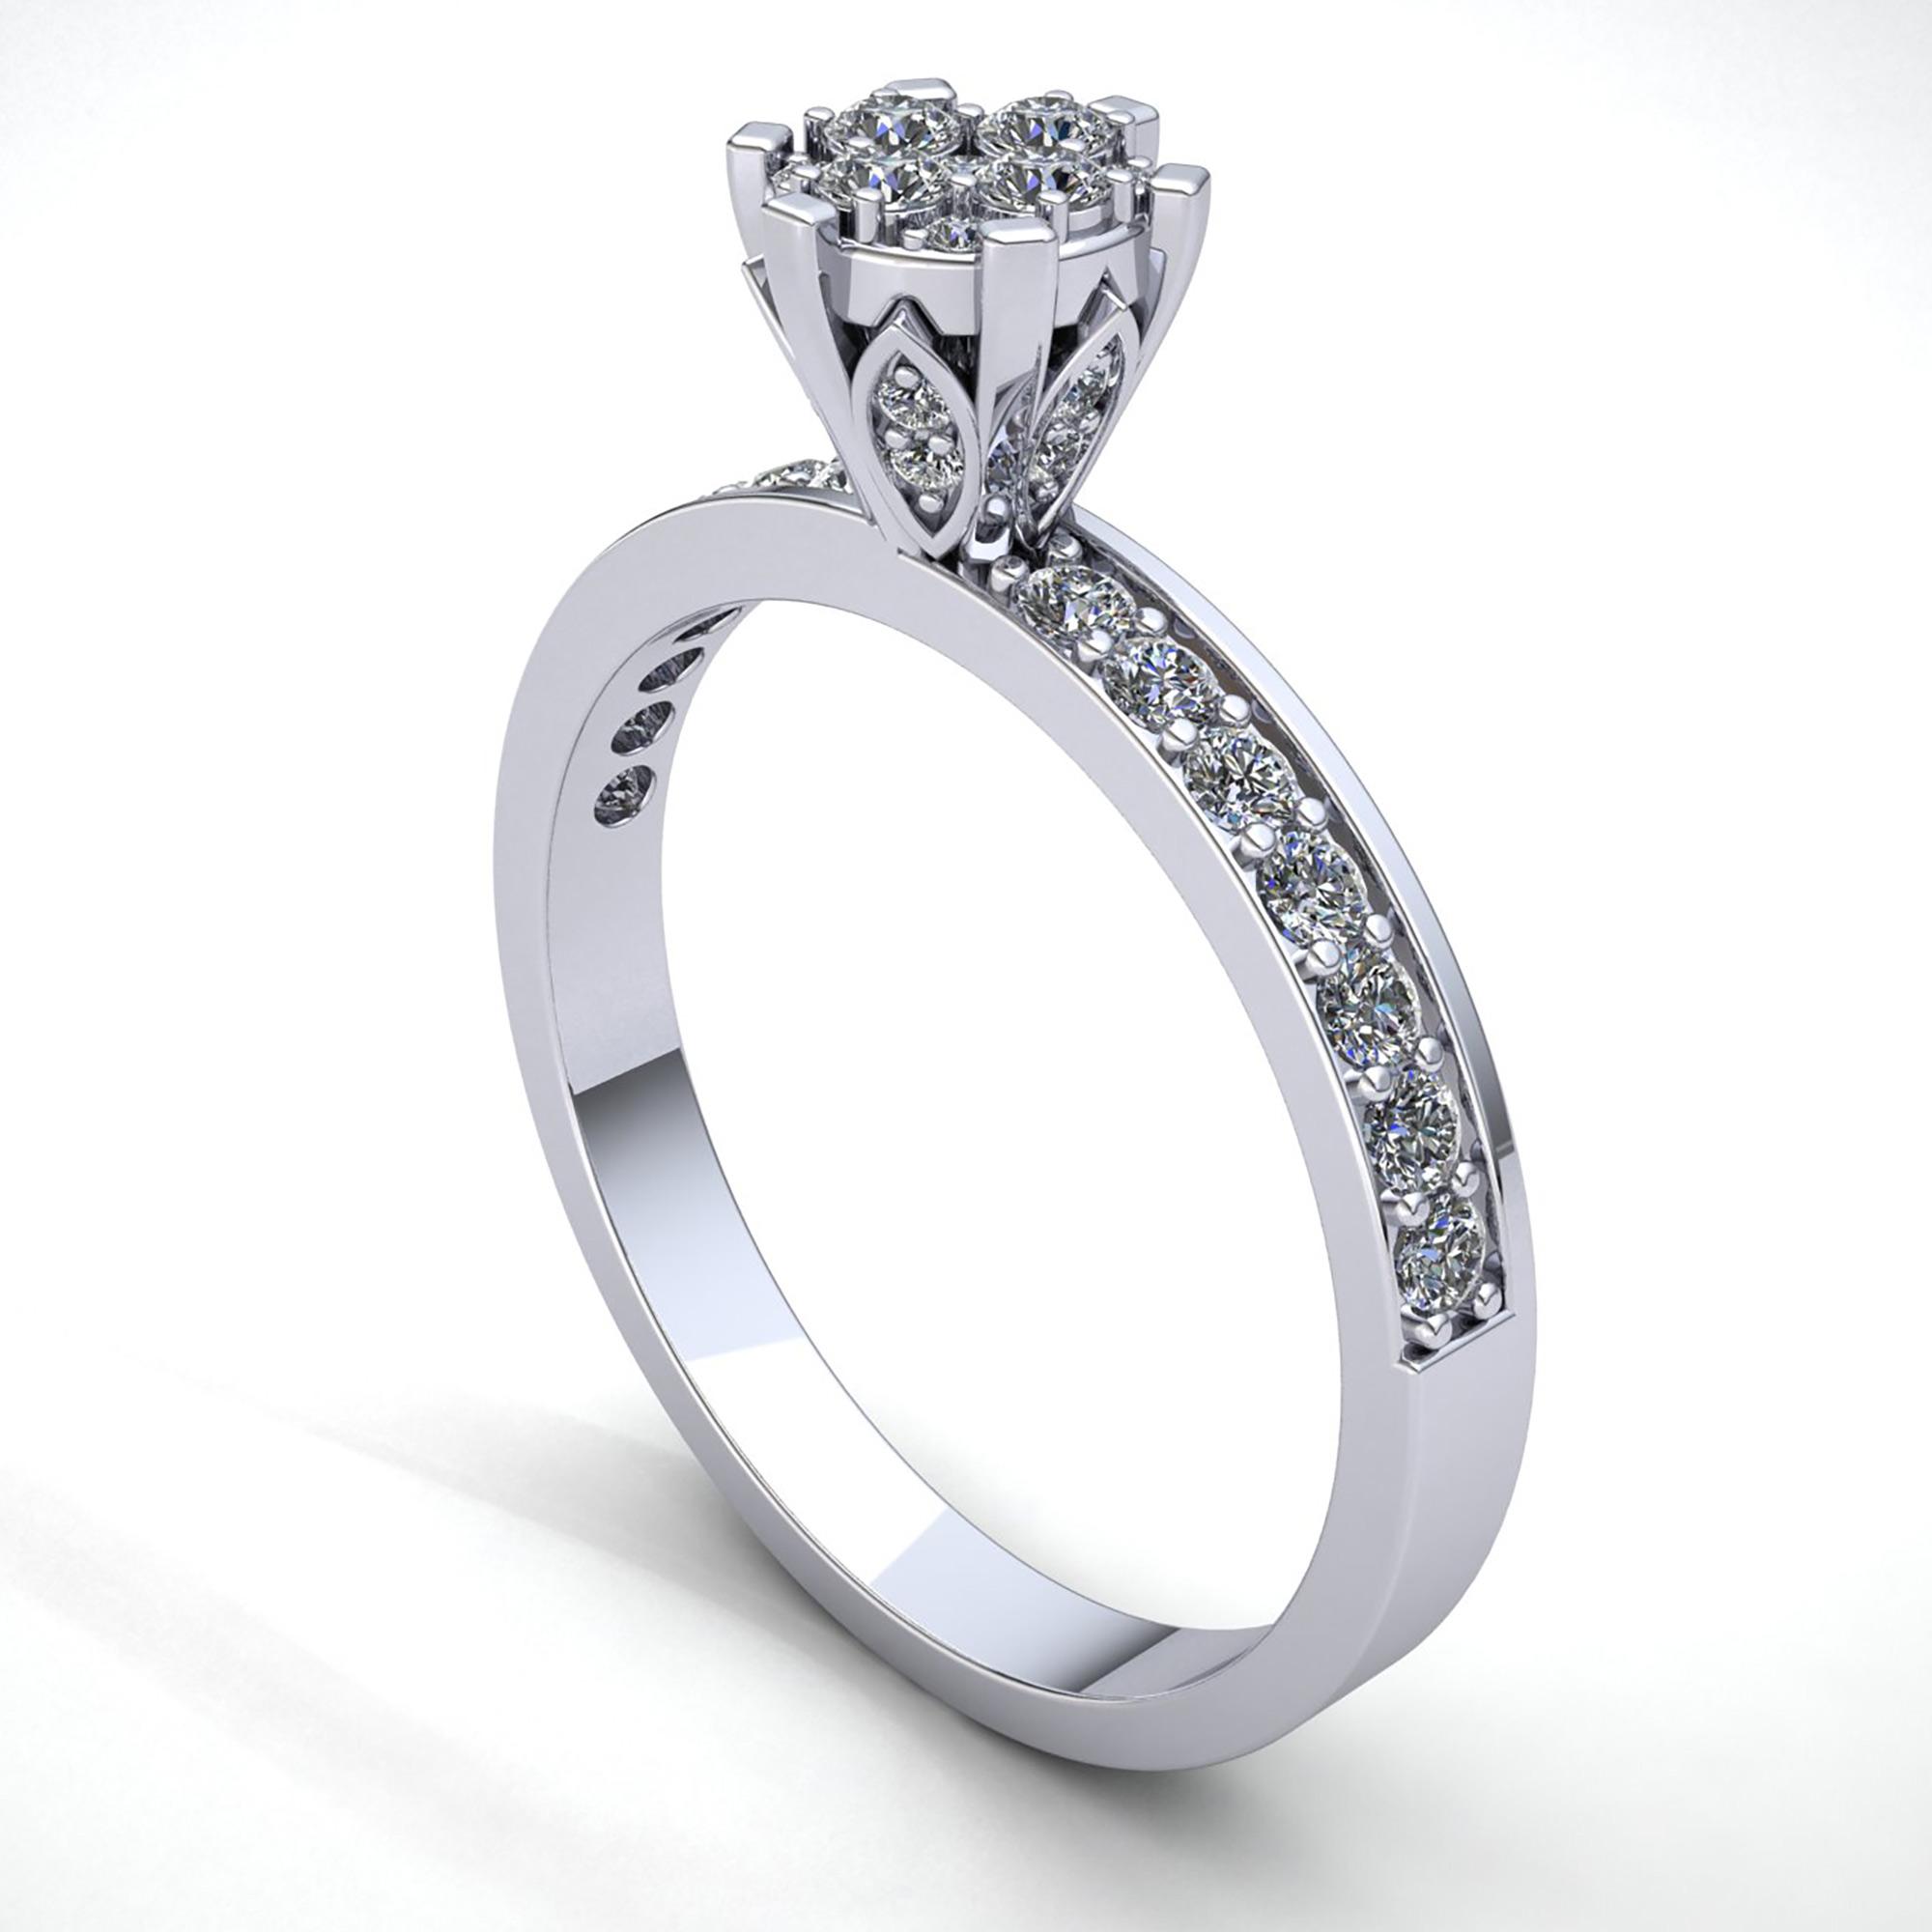 Genuine-3ct-Round-Cut-Diamond-Ladies-Bridal-Cluster-Engagement-Ring-14K-Gold